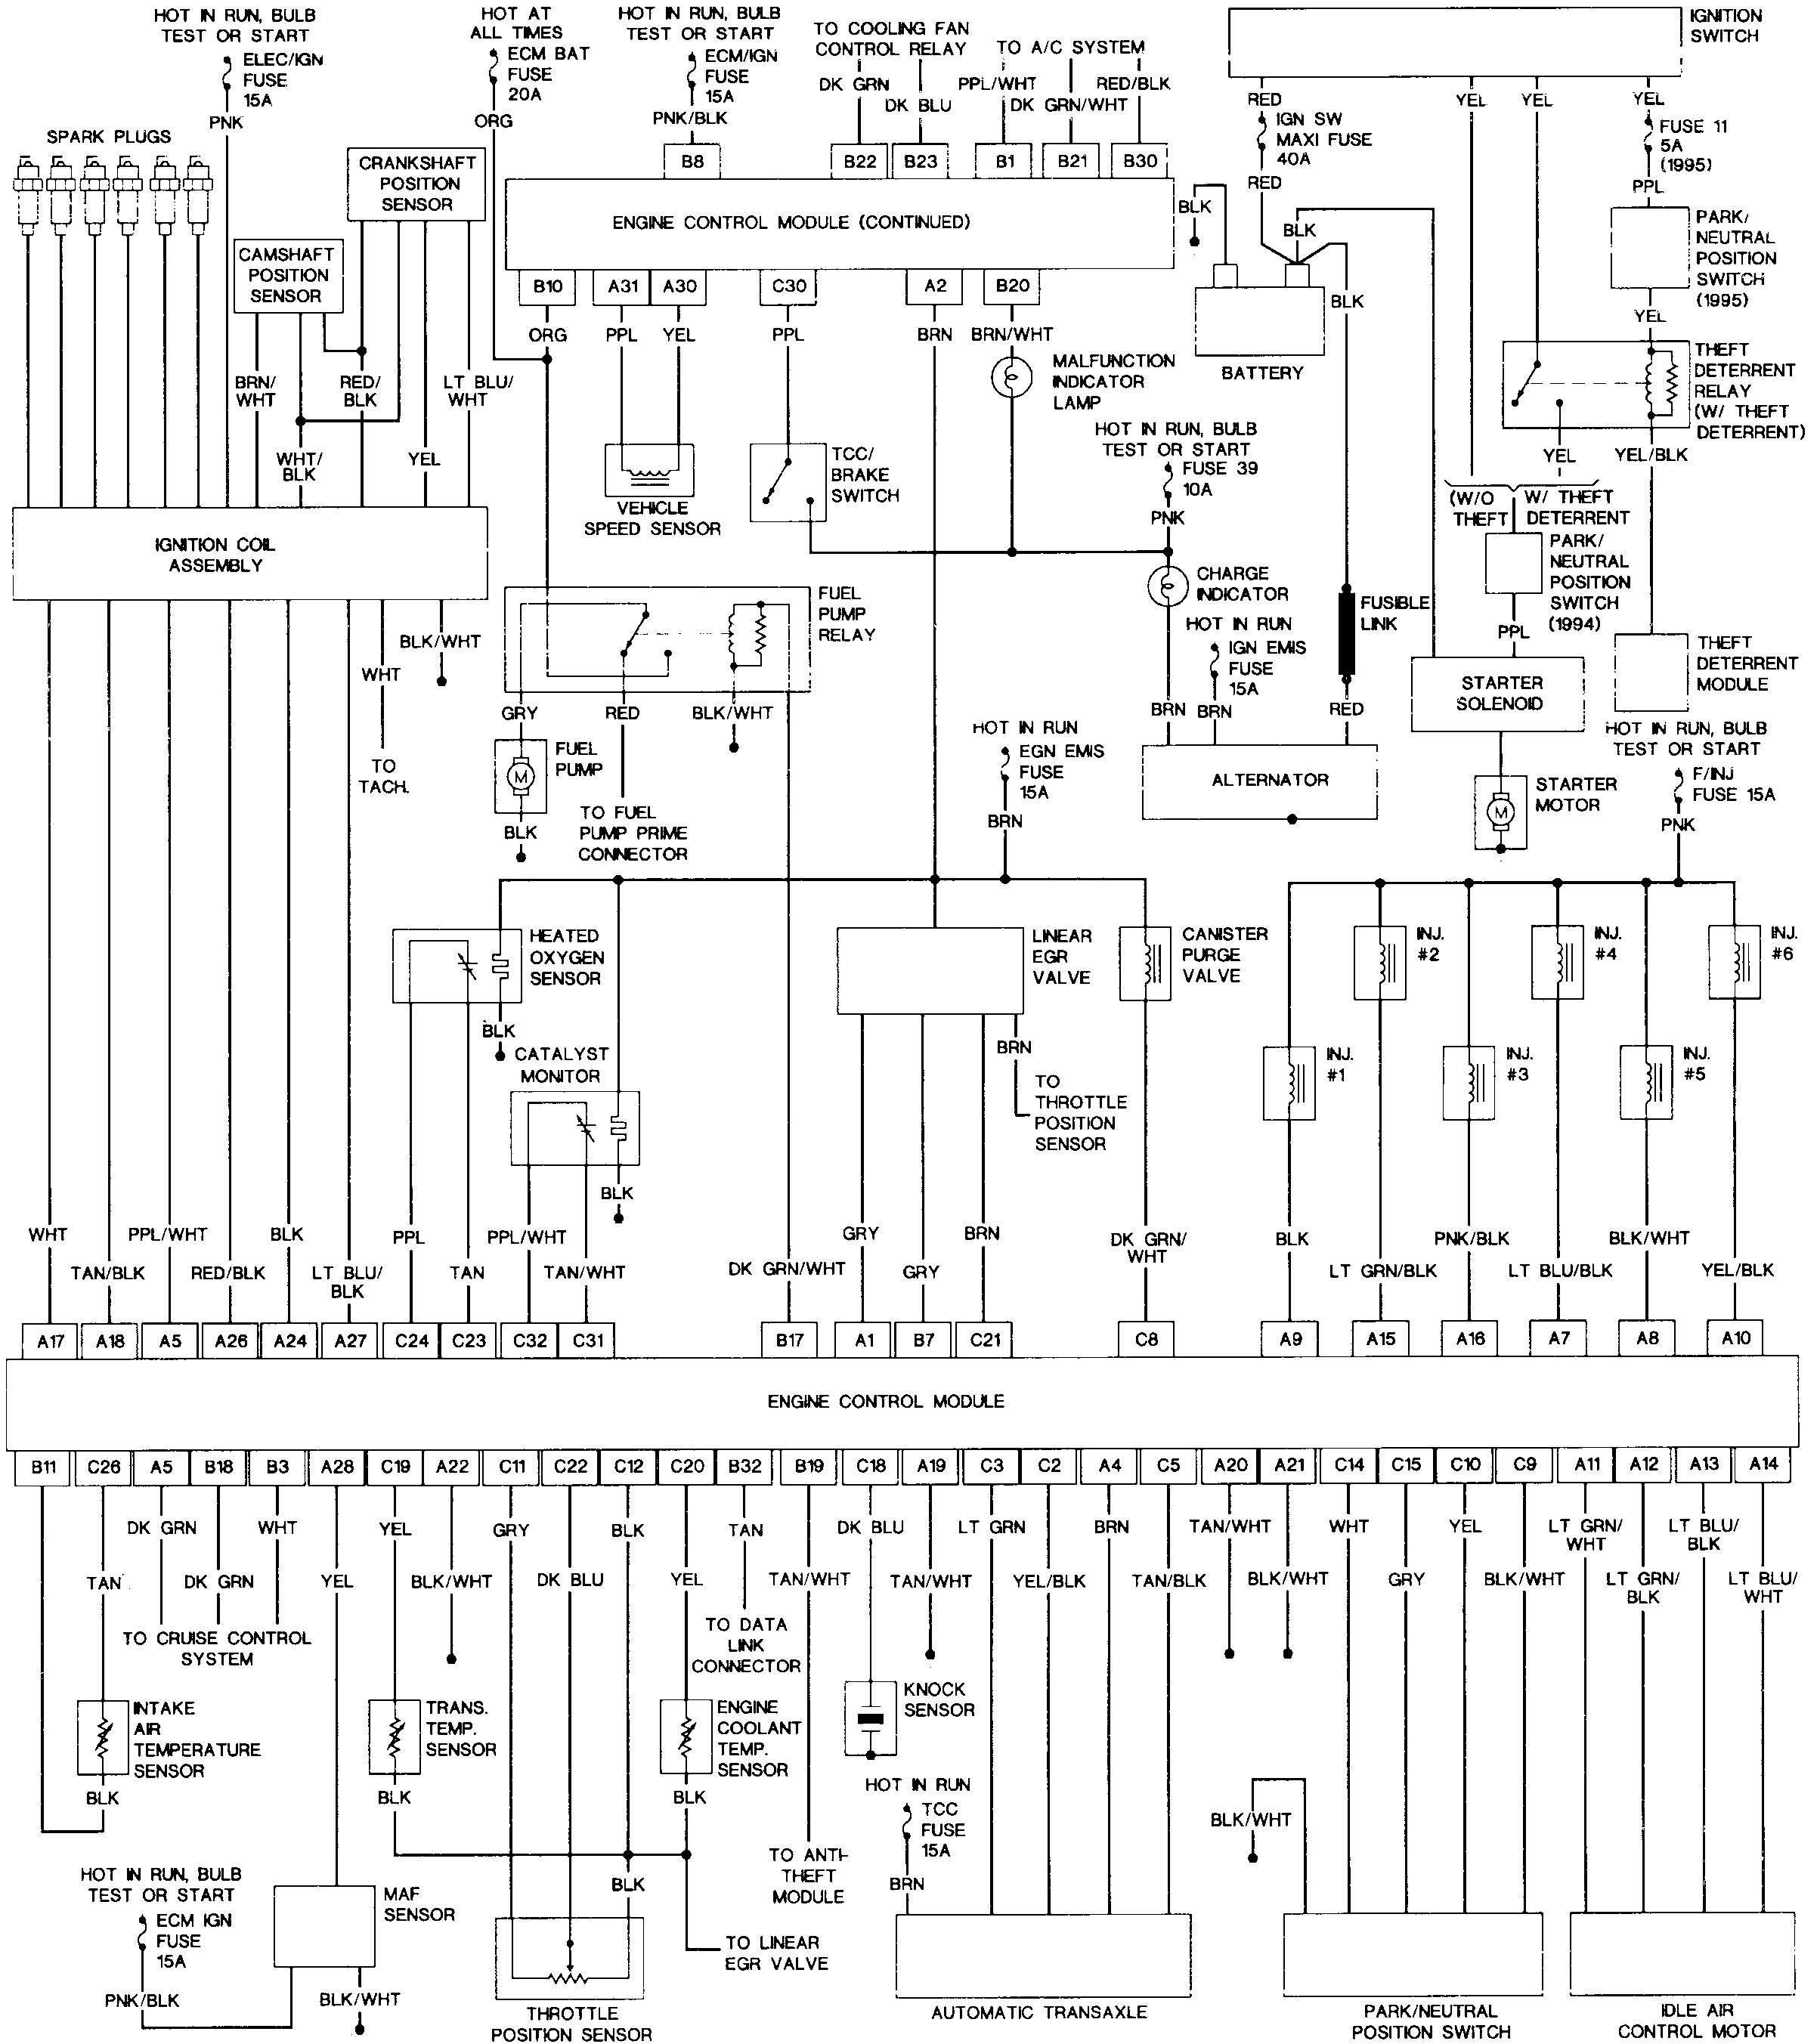 buick rendezvous engine diagram